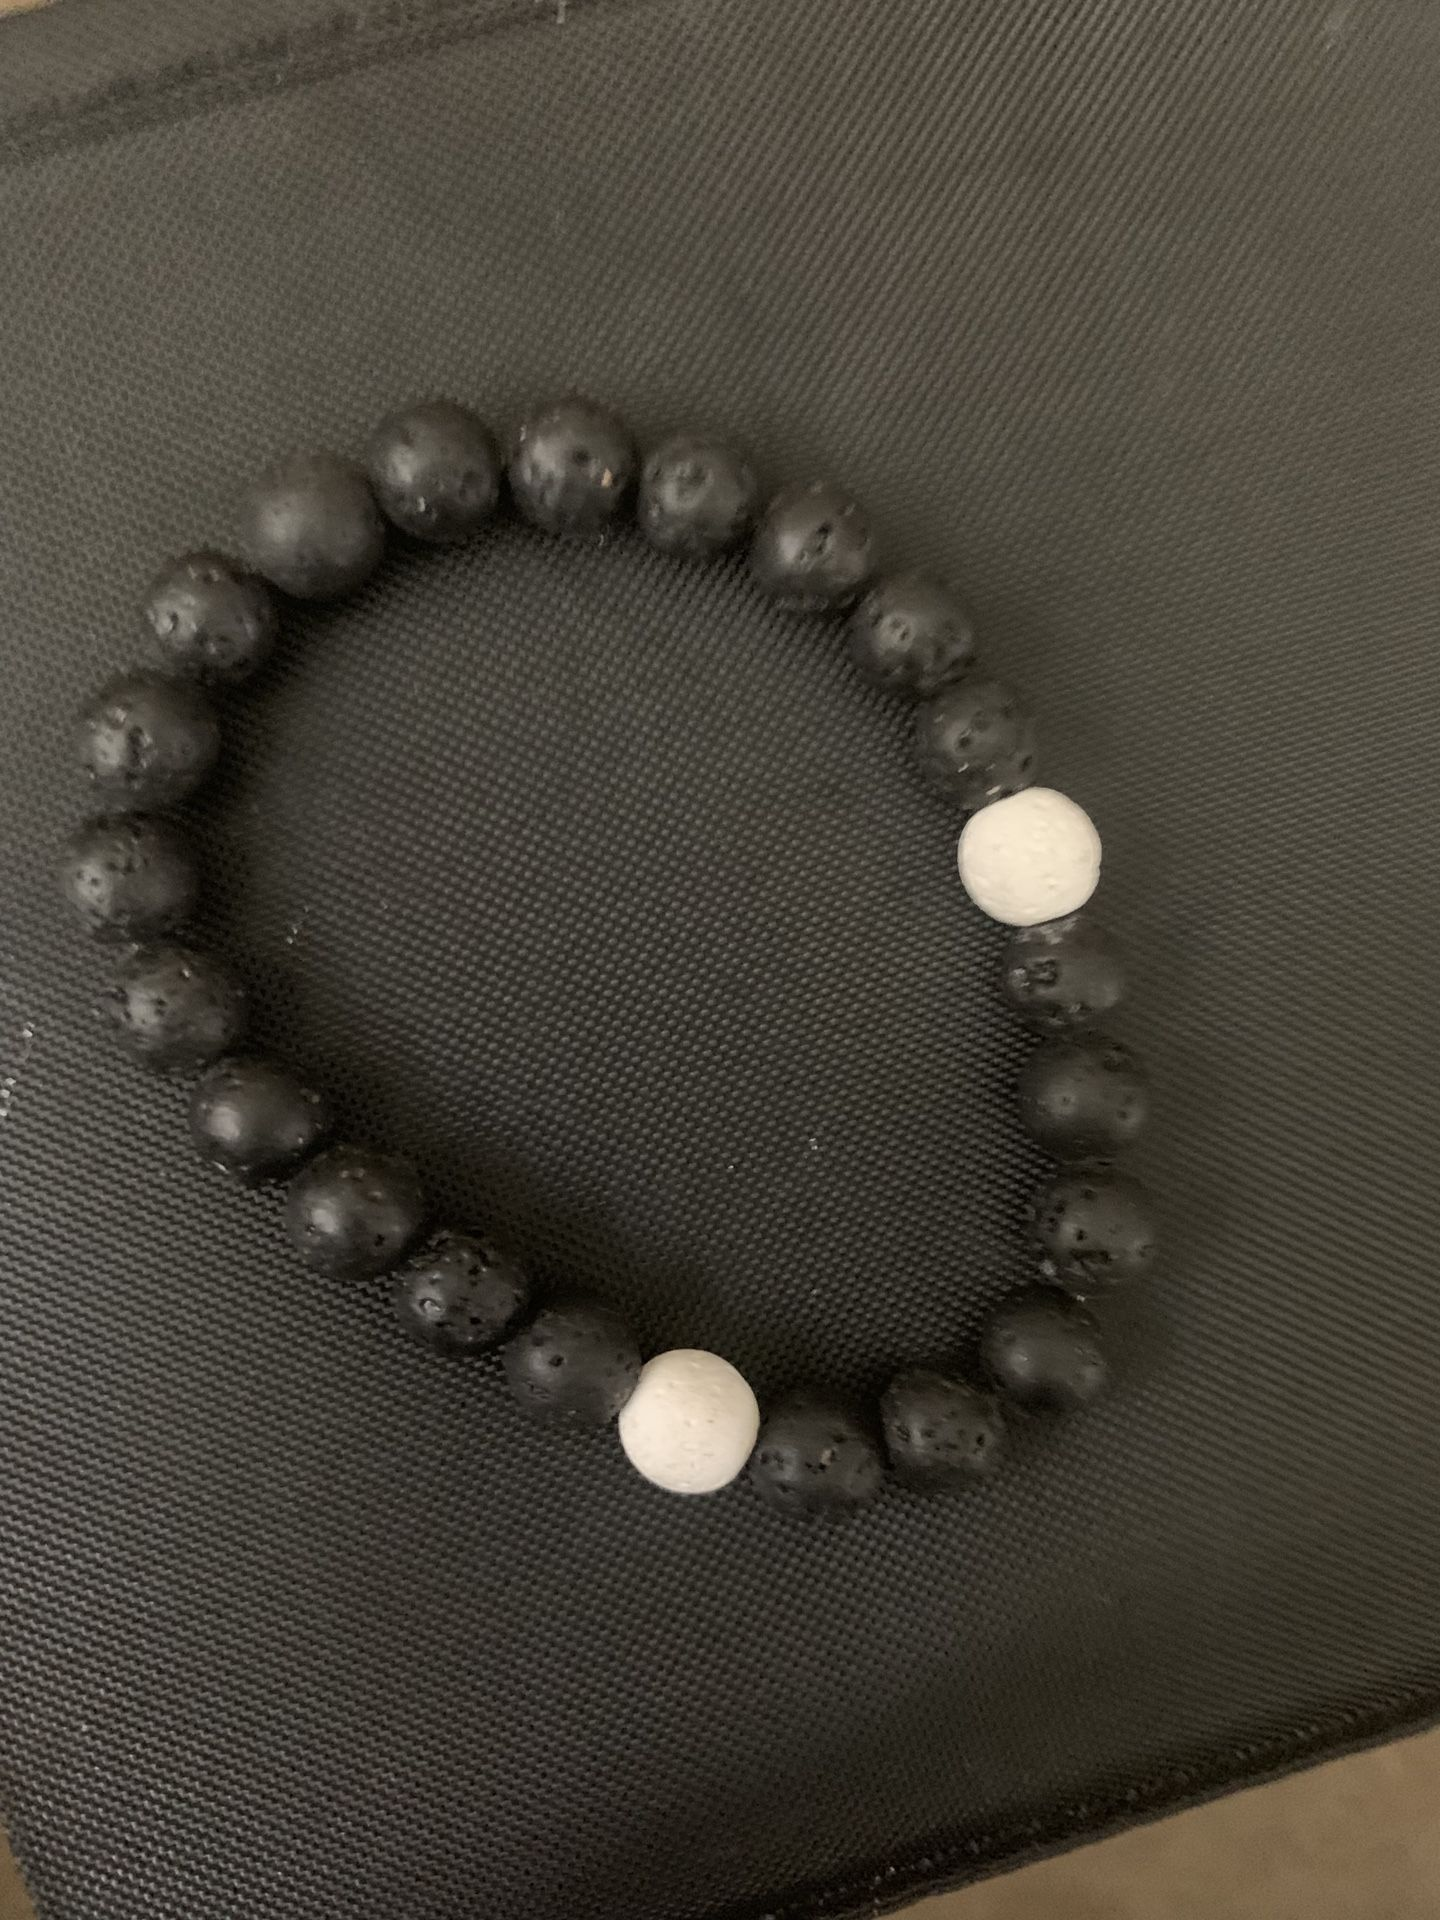 Beautiful Bracelets Handmade with Love